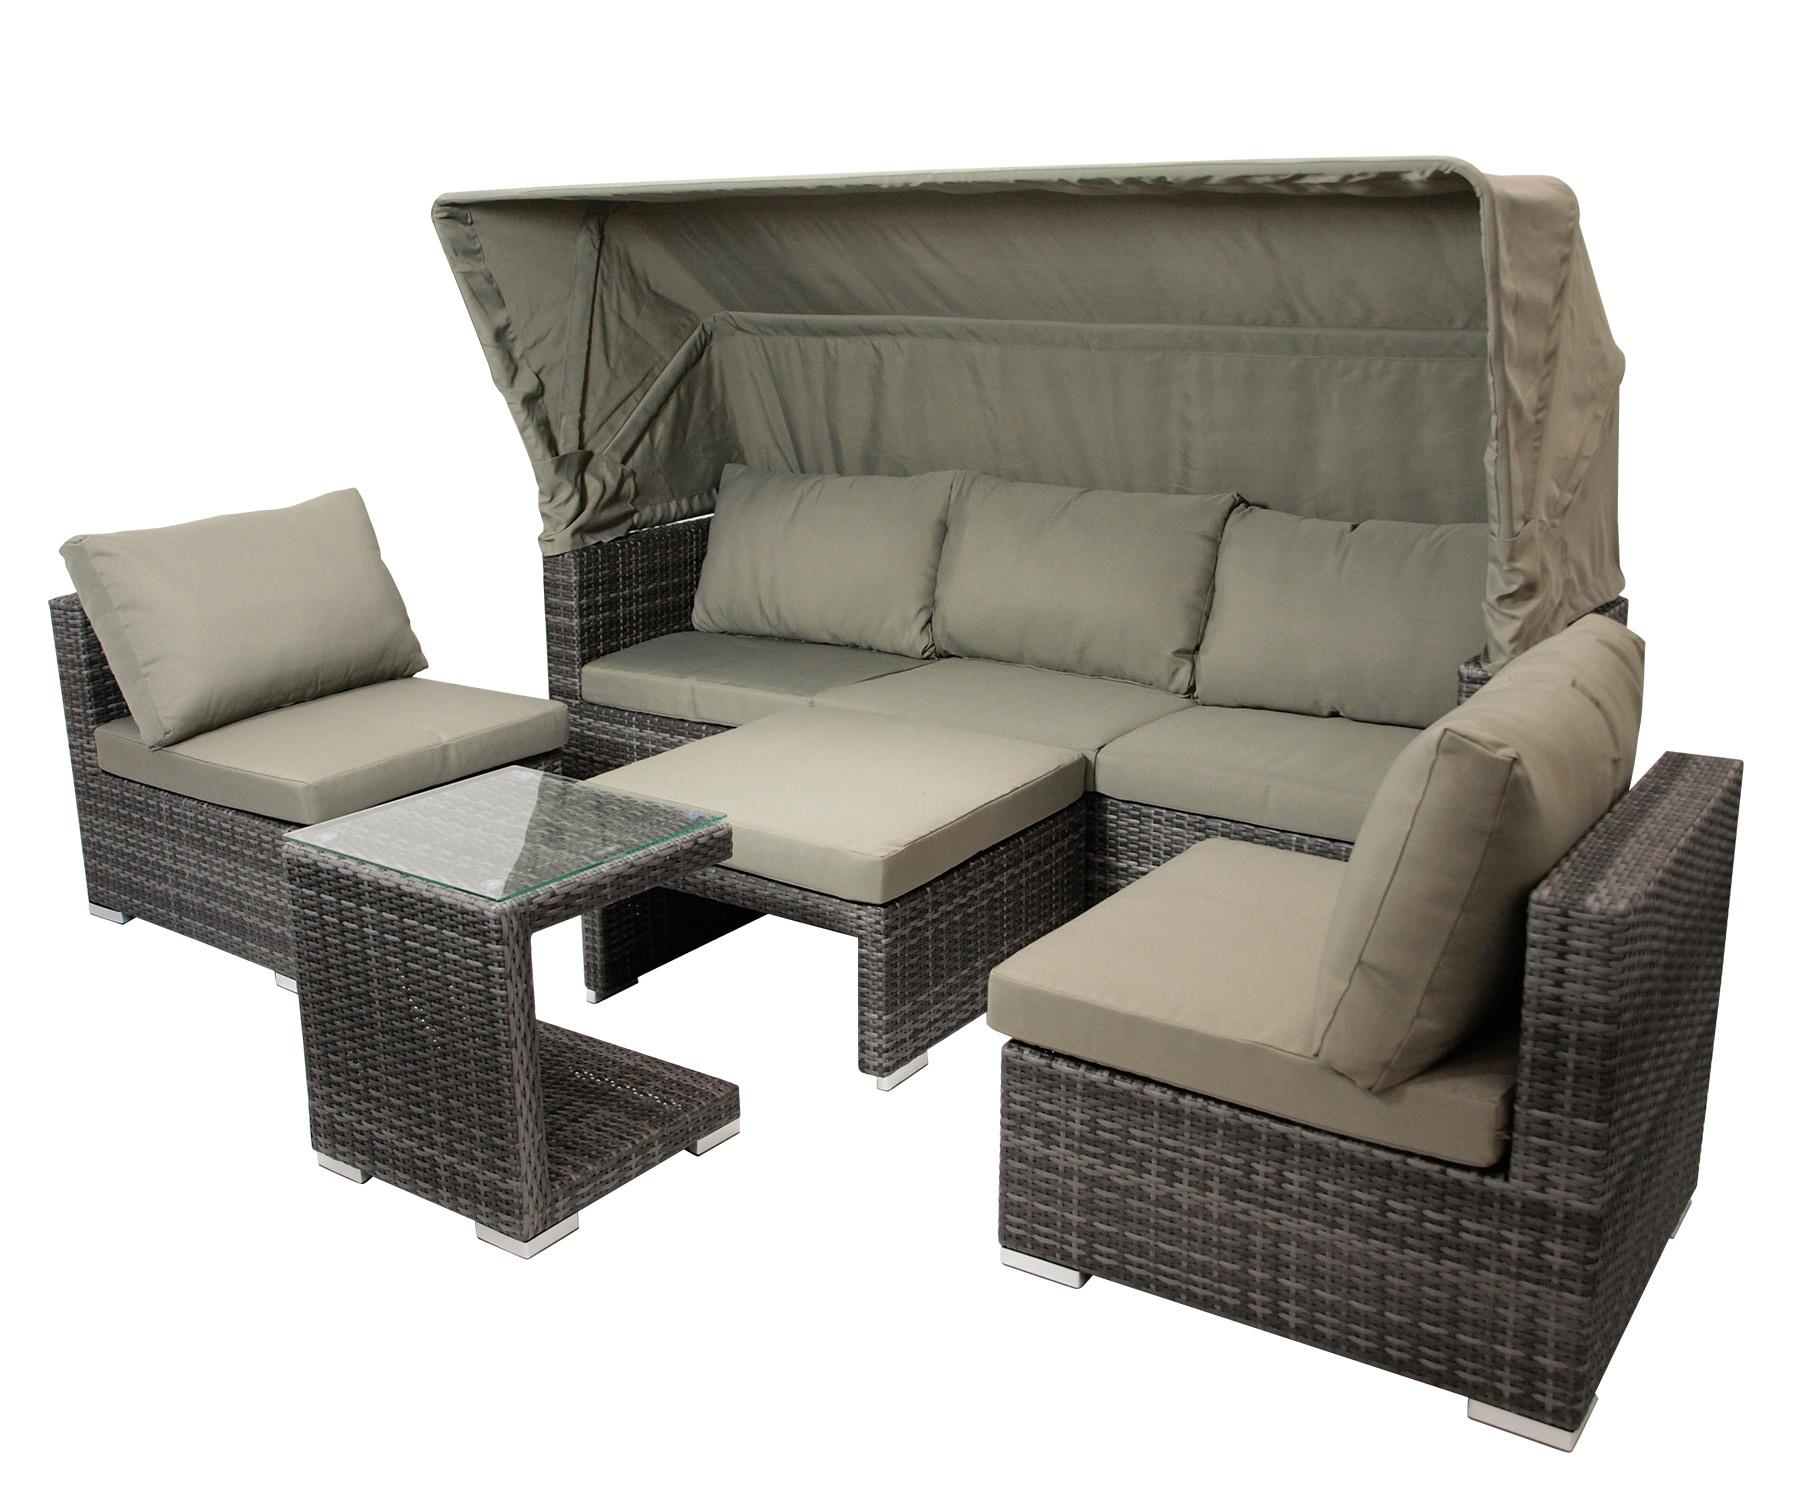 loungeset funktions sofaset manacor 16 teilig alu polyrattan grau 2 wahl ebay. Black Bedroom Furniture Sets. Home Design Ideas